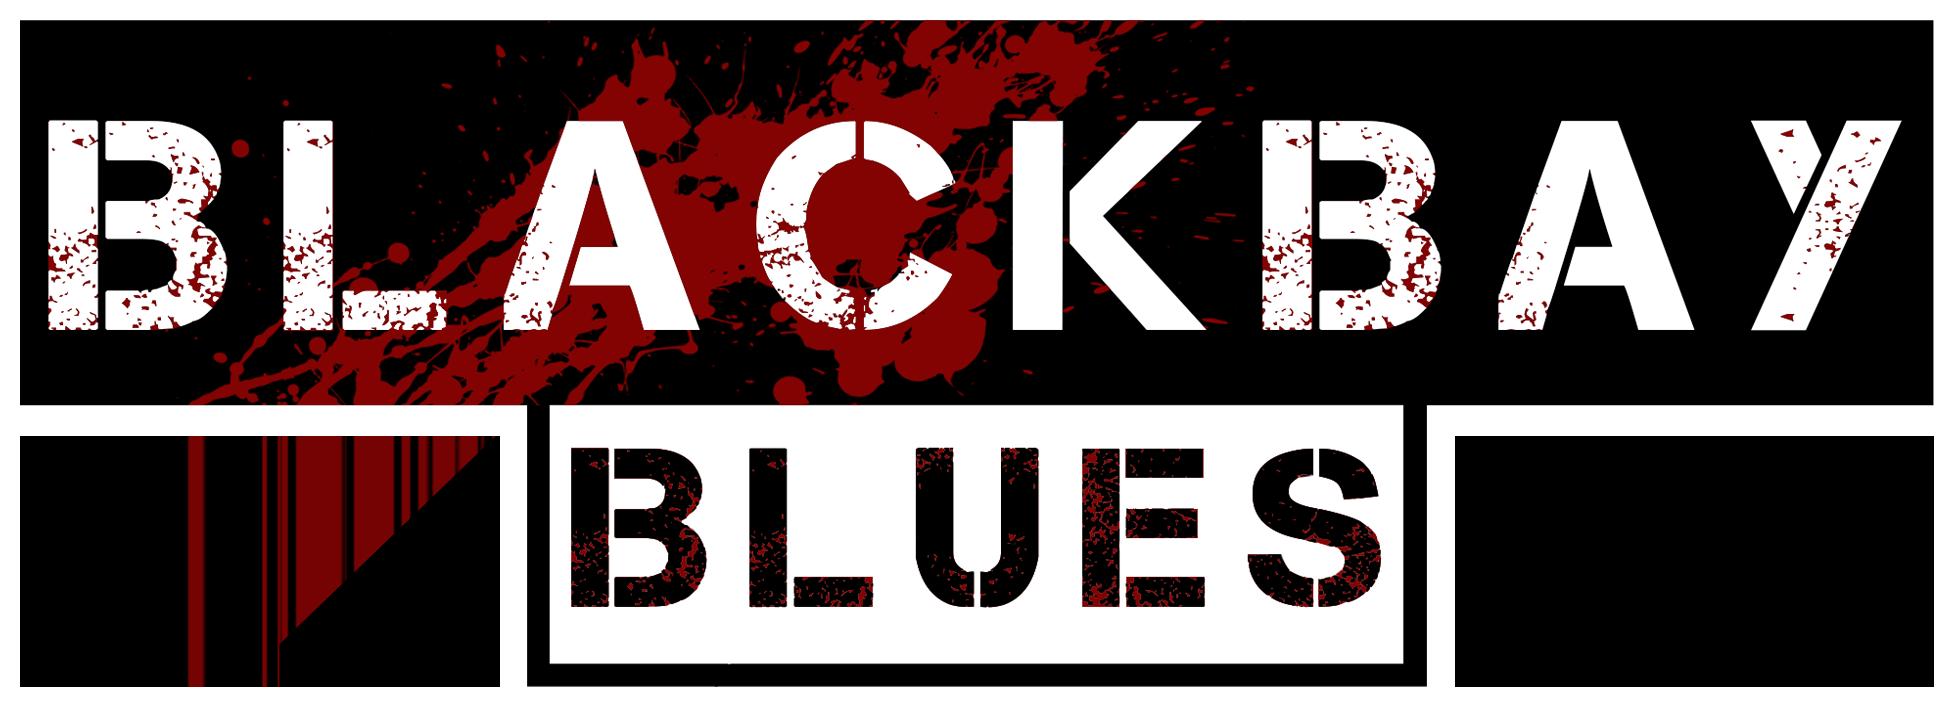 The Blackbay Blues logo